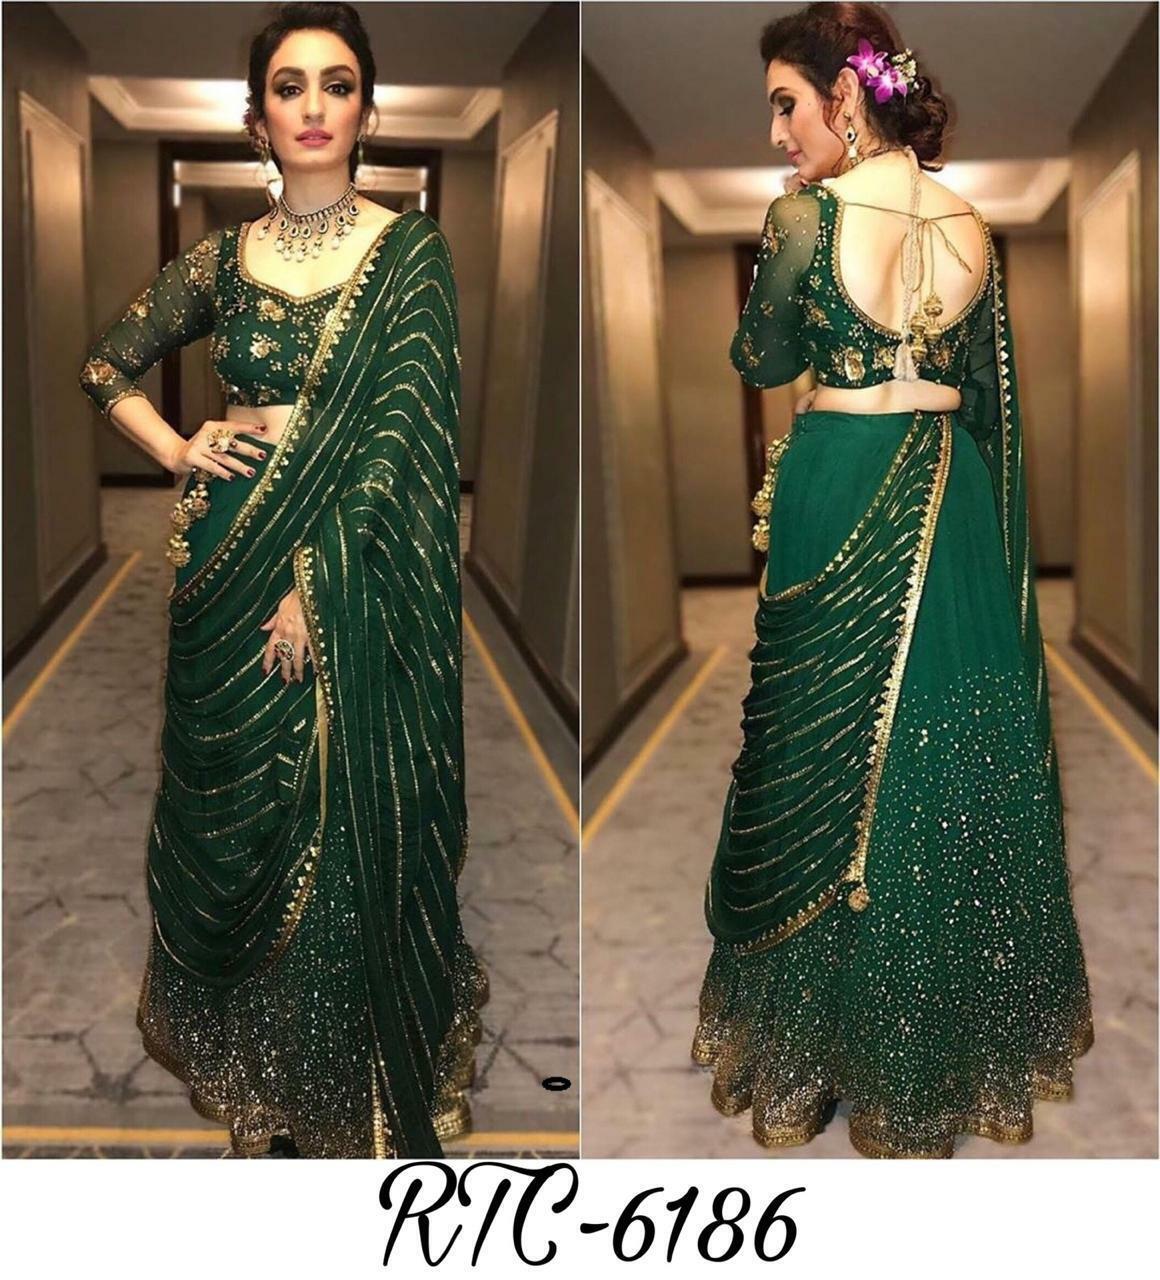 Georgette Embroidery work Lehenga Indian Design Pakistani Wedding Wear Choli